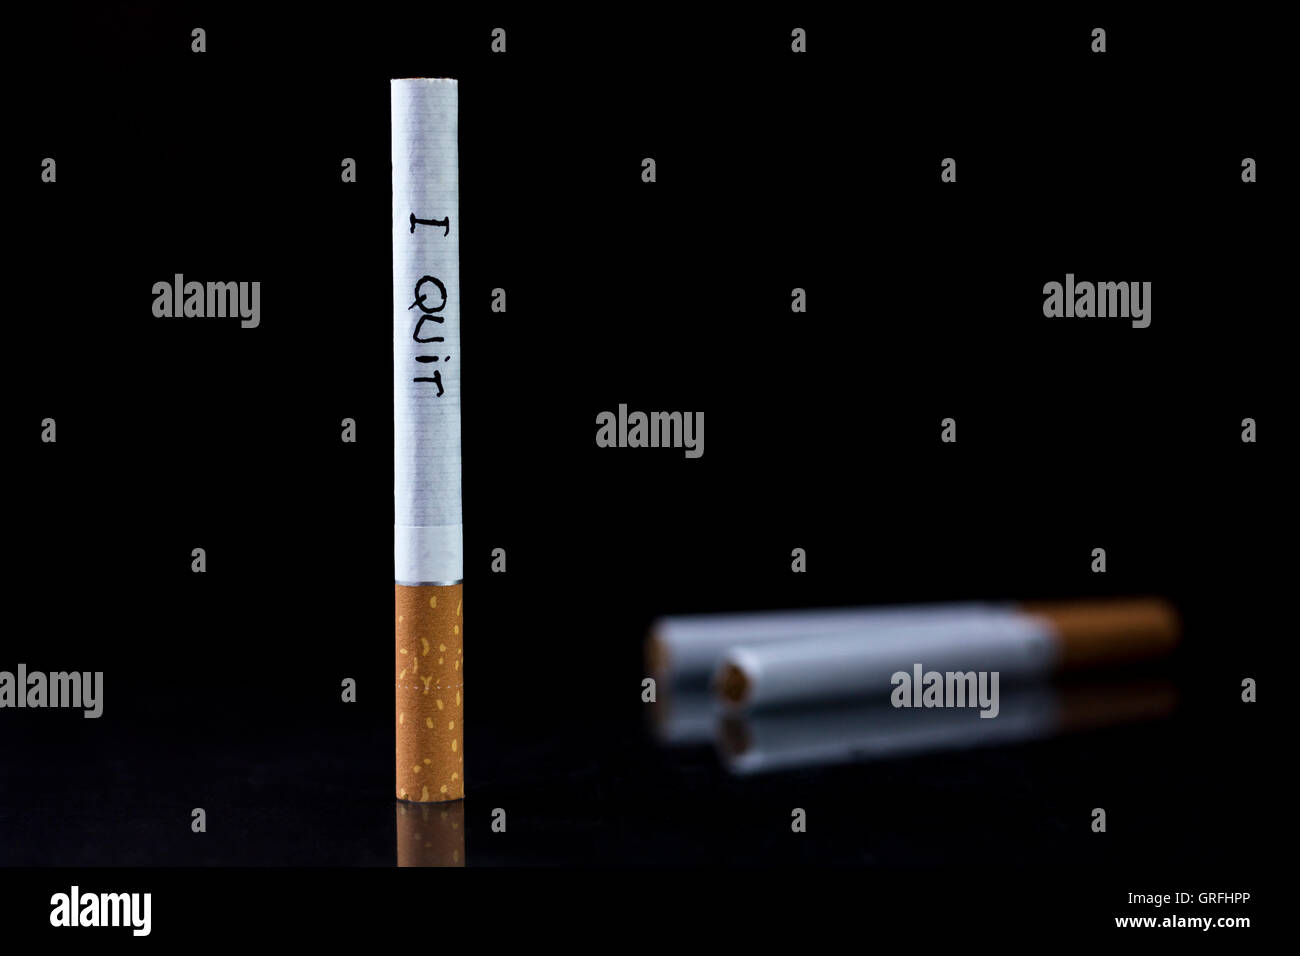 Quit smoking message - Stock Image